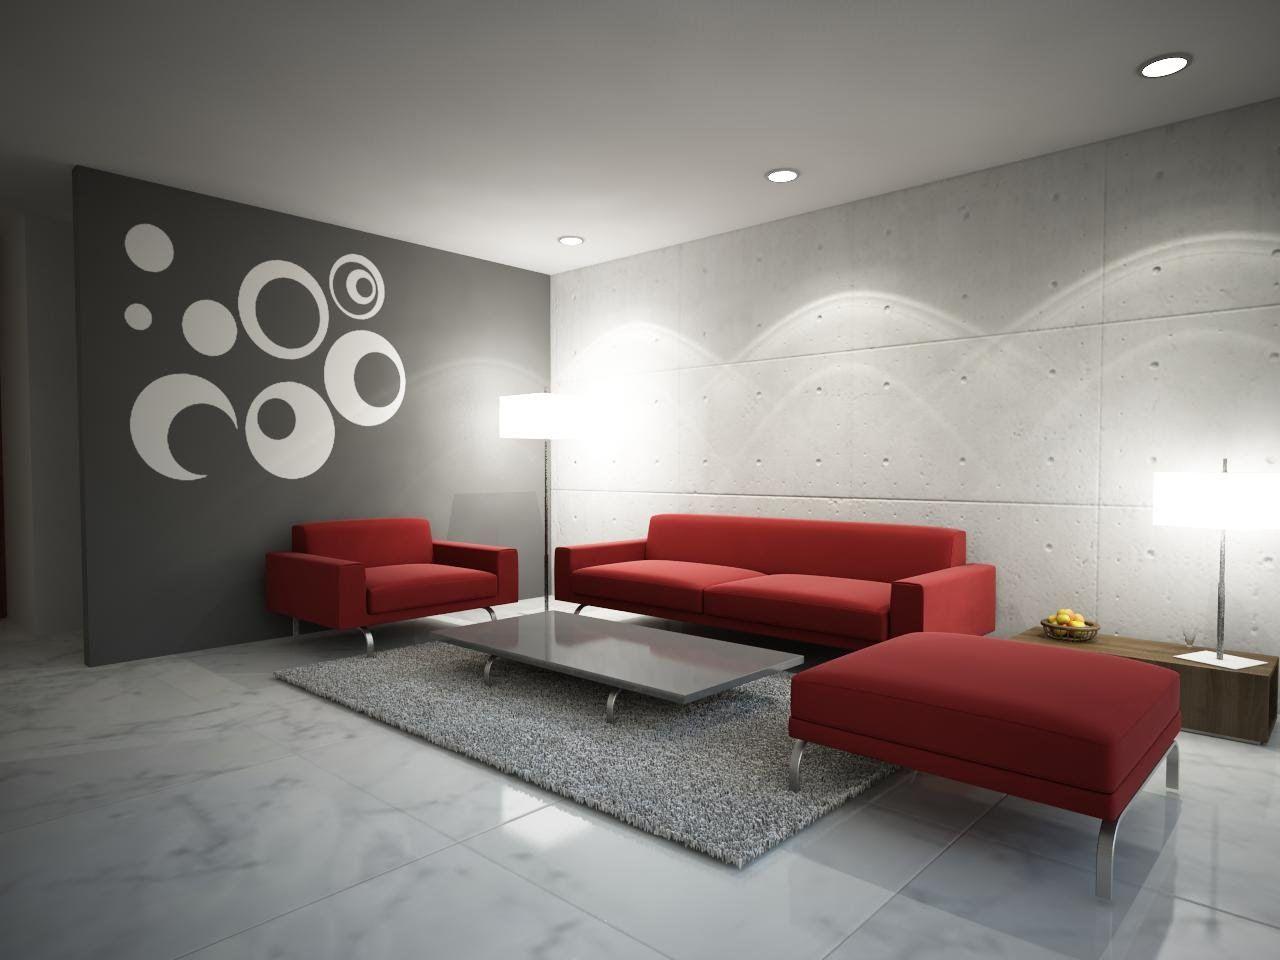 Arquitectura de interiores dise o dise o de for Arquitectura diseno y construccion